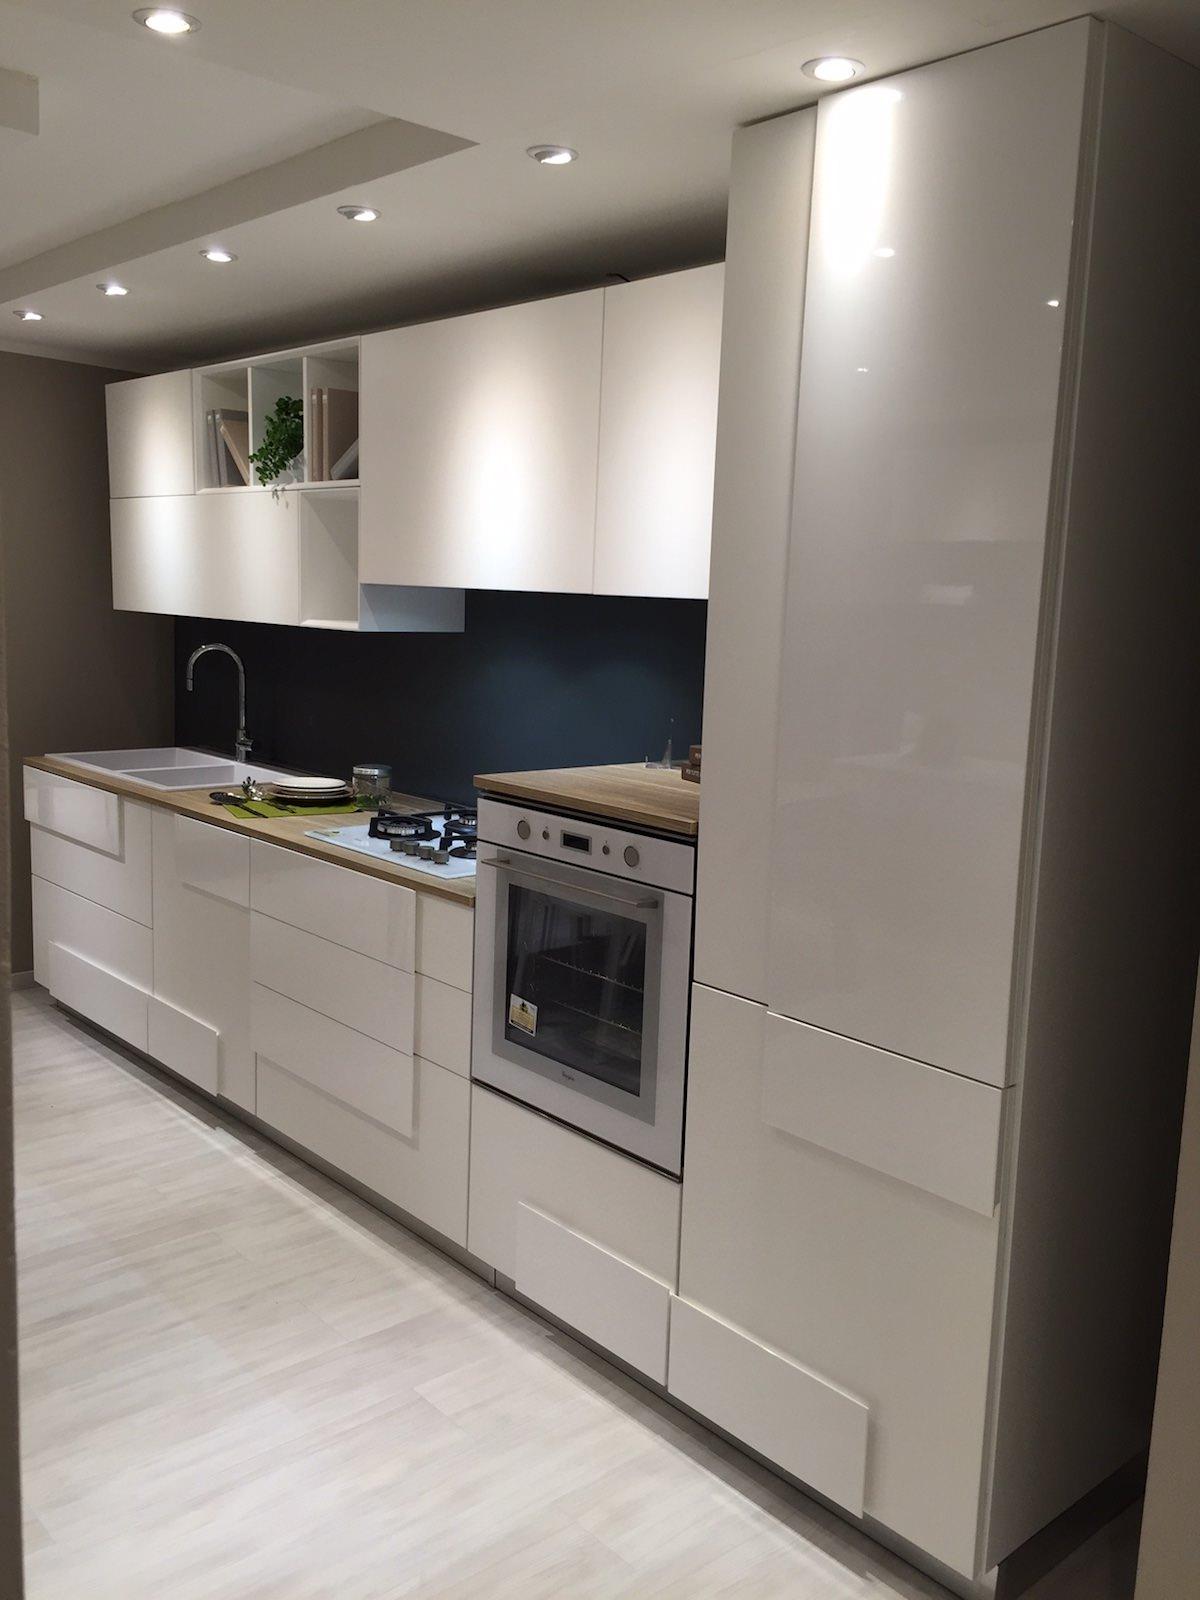 Cucina LUBE - Mod. CREATIVA - Rafaschieri Arredamenti